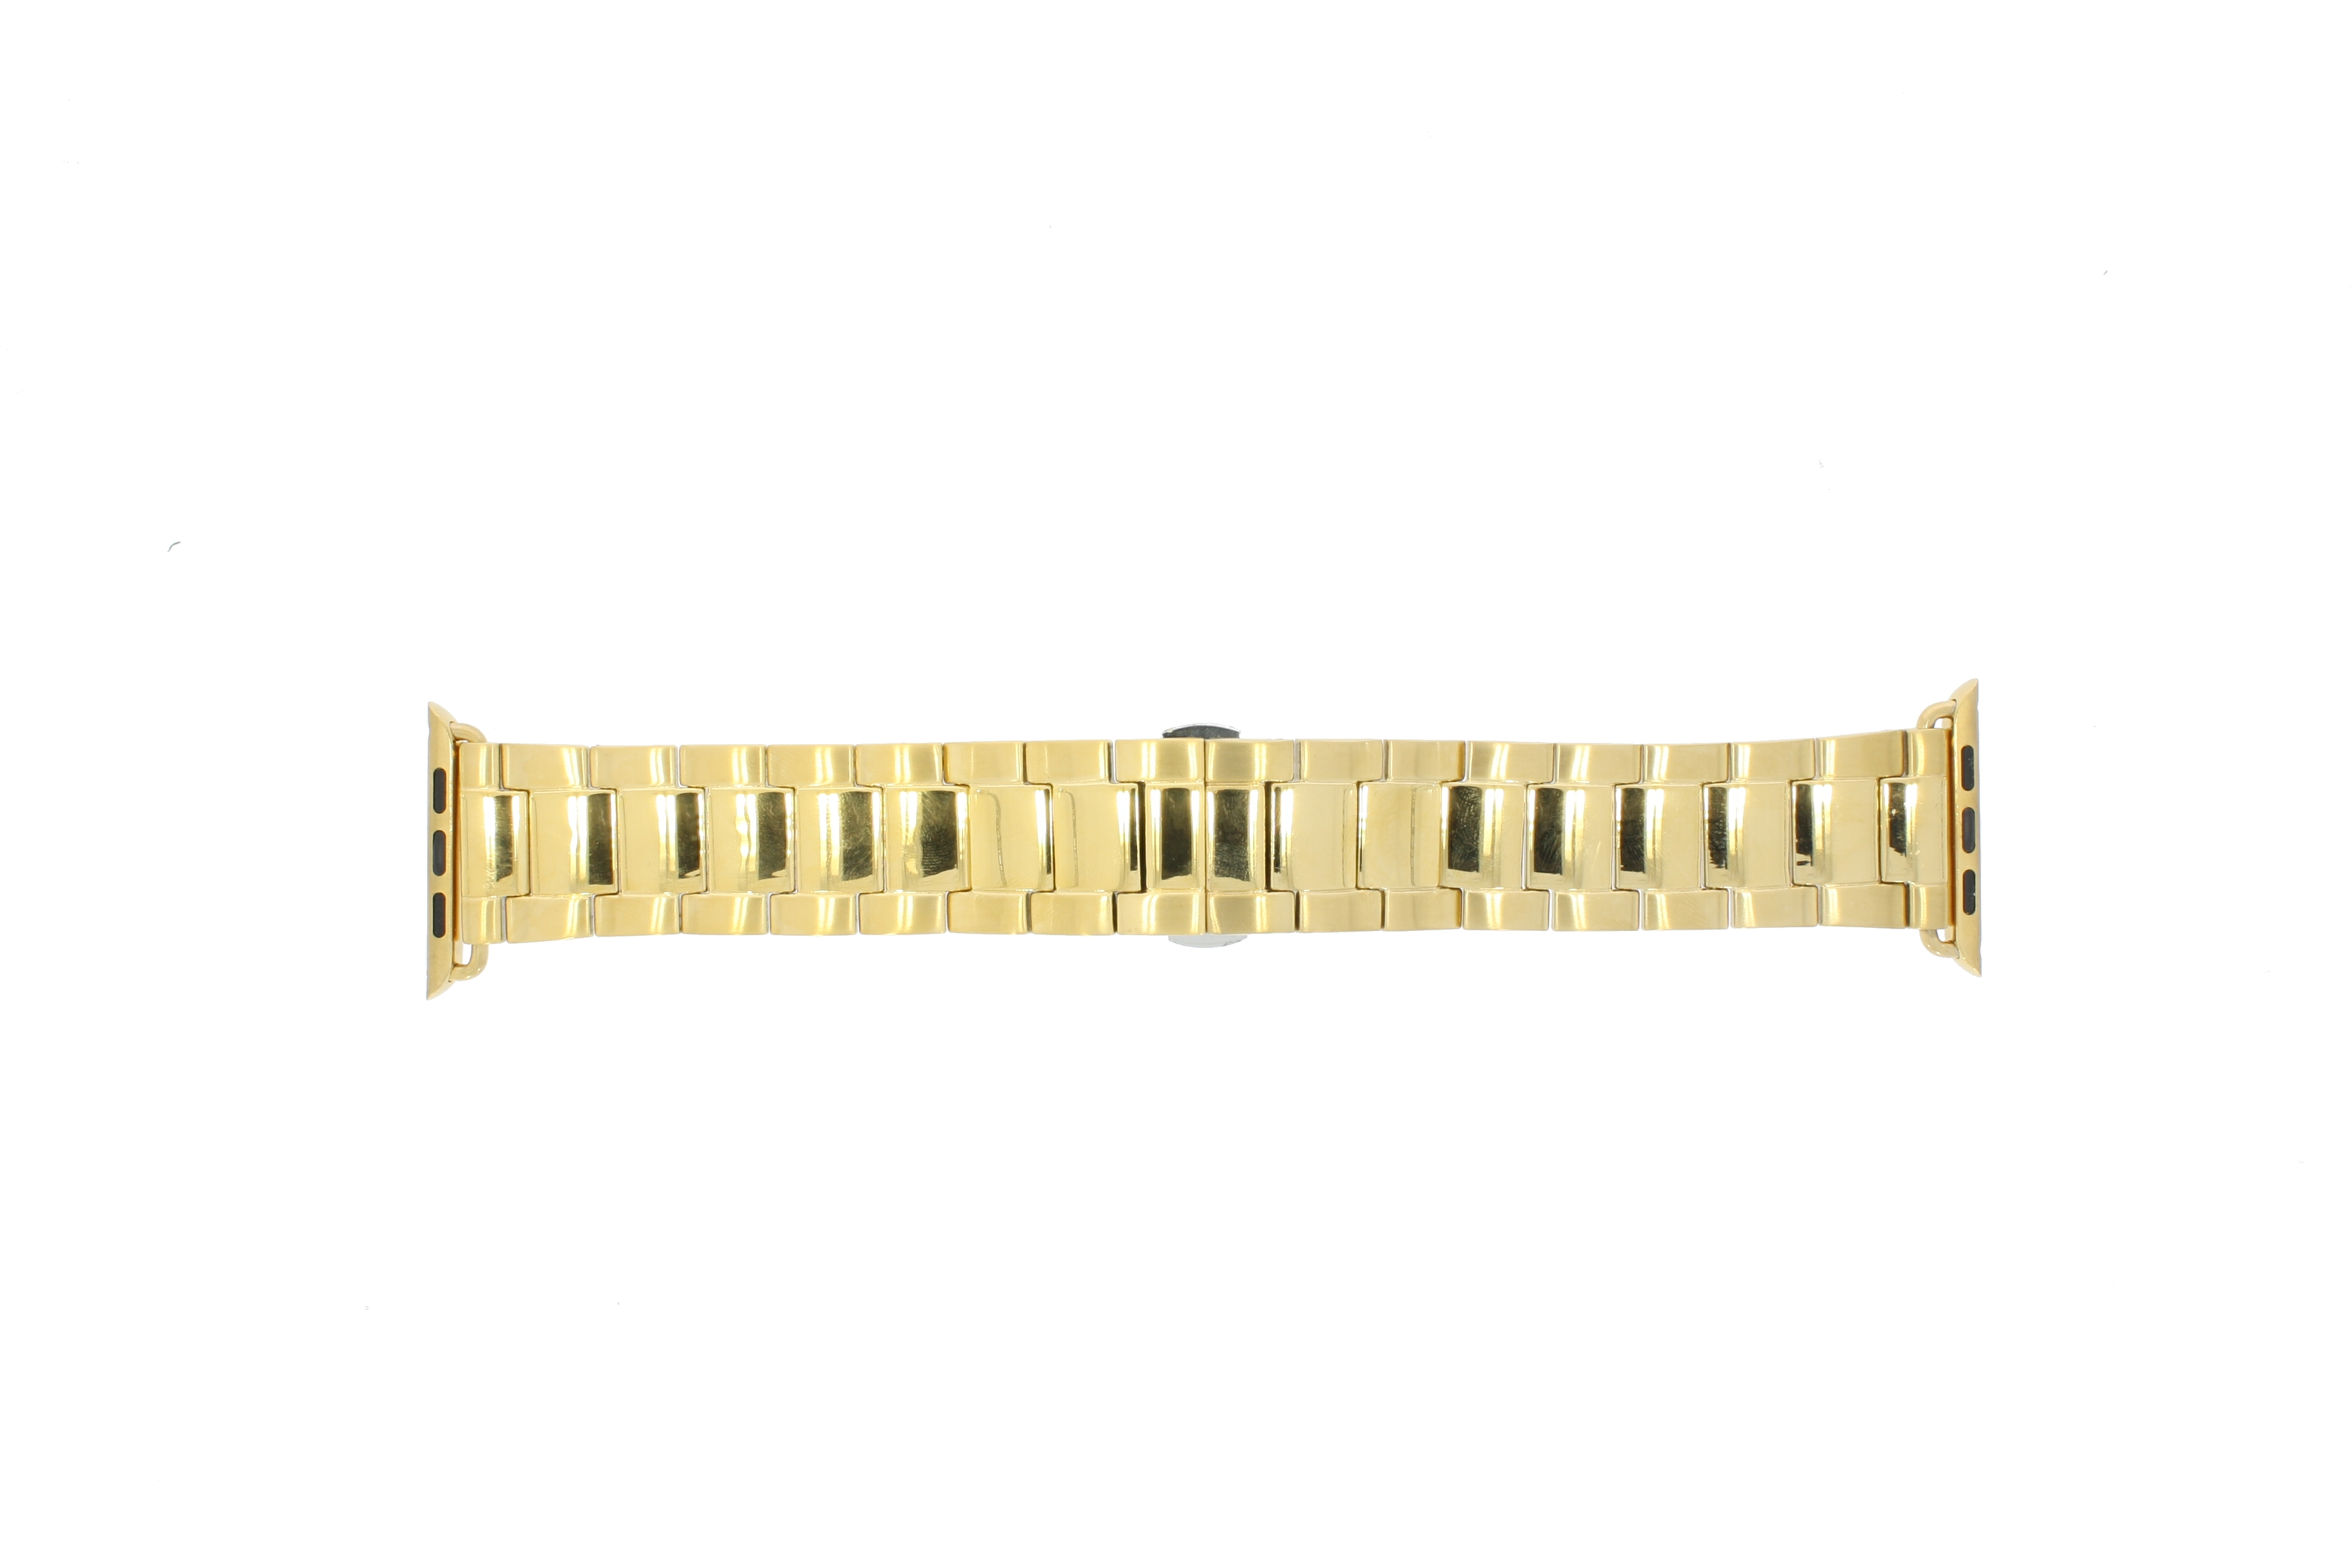 Apple (replacement model) klockarmband LS.AB.106 Stål Guld (Doublé) 42mm